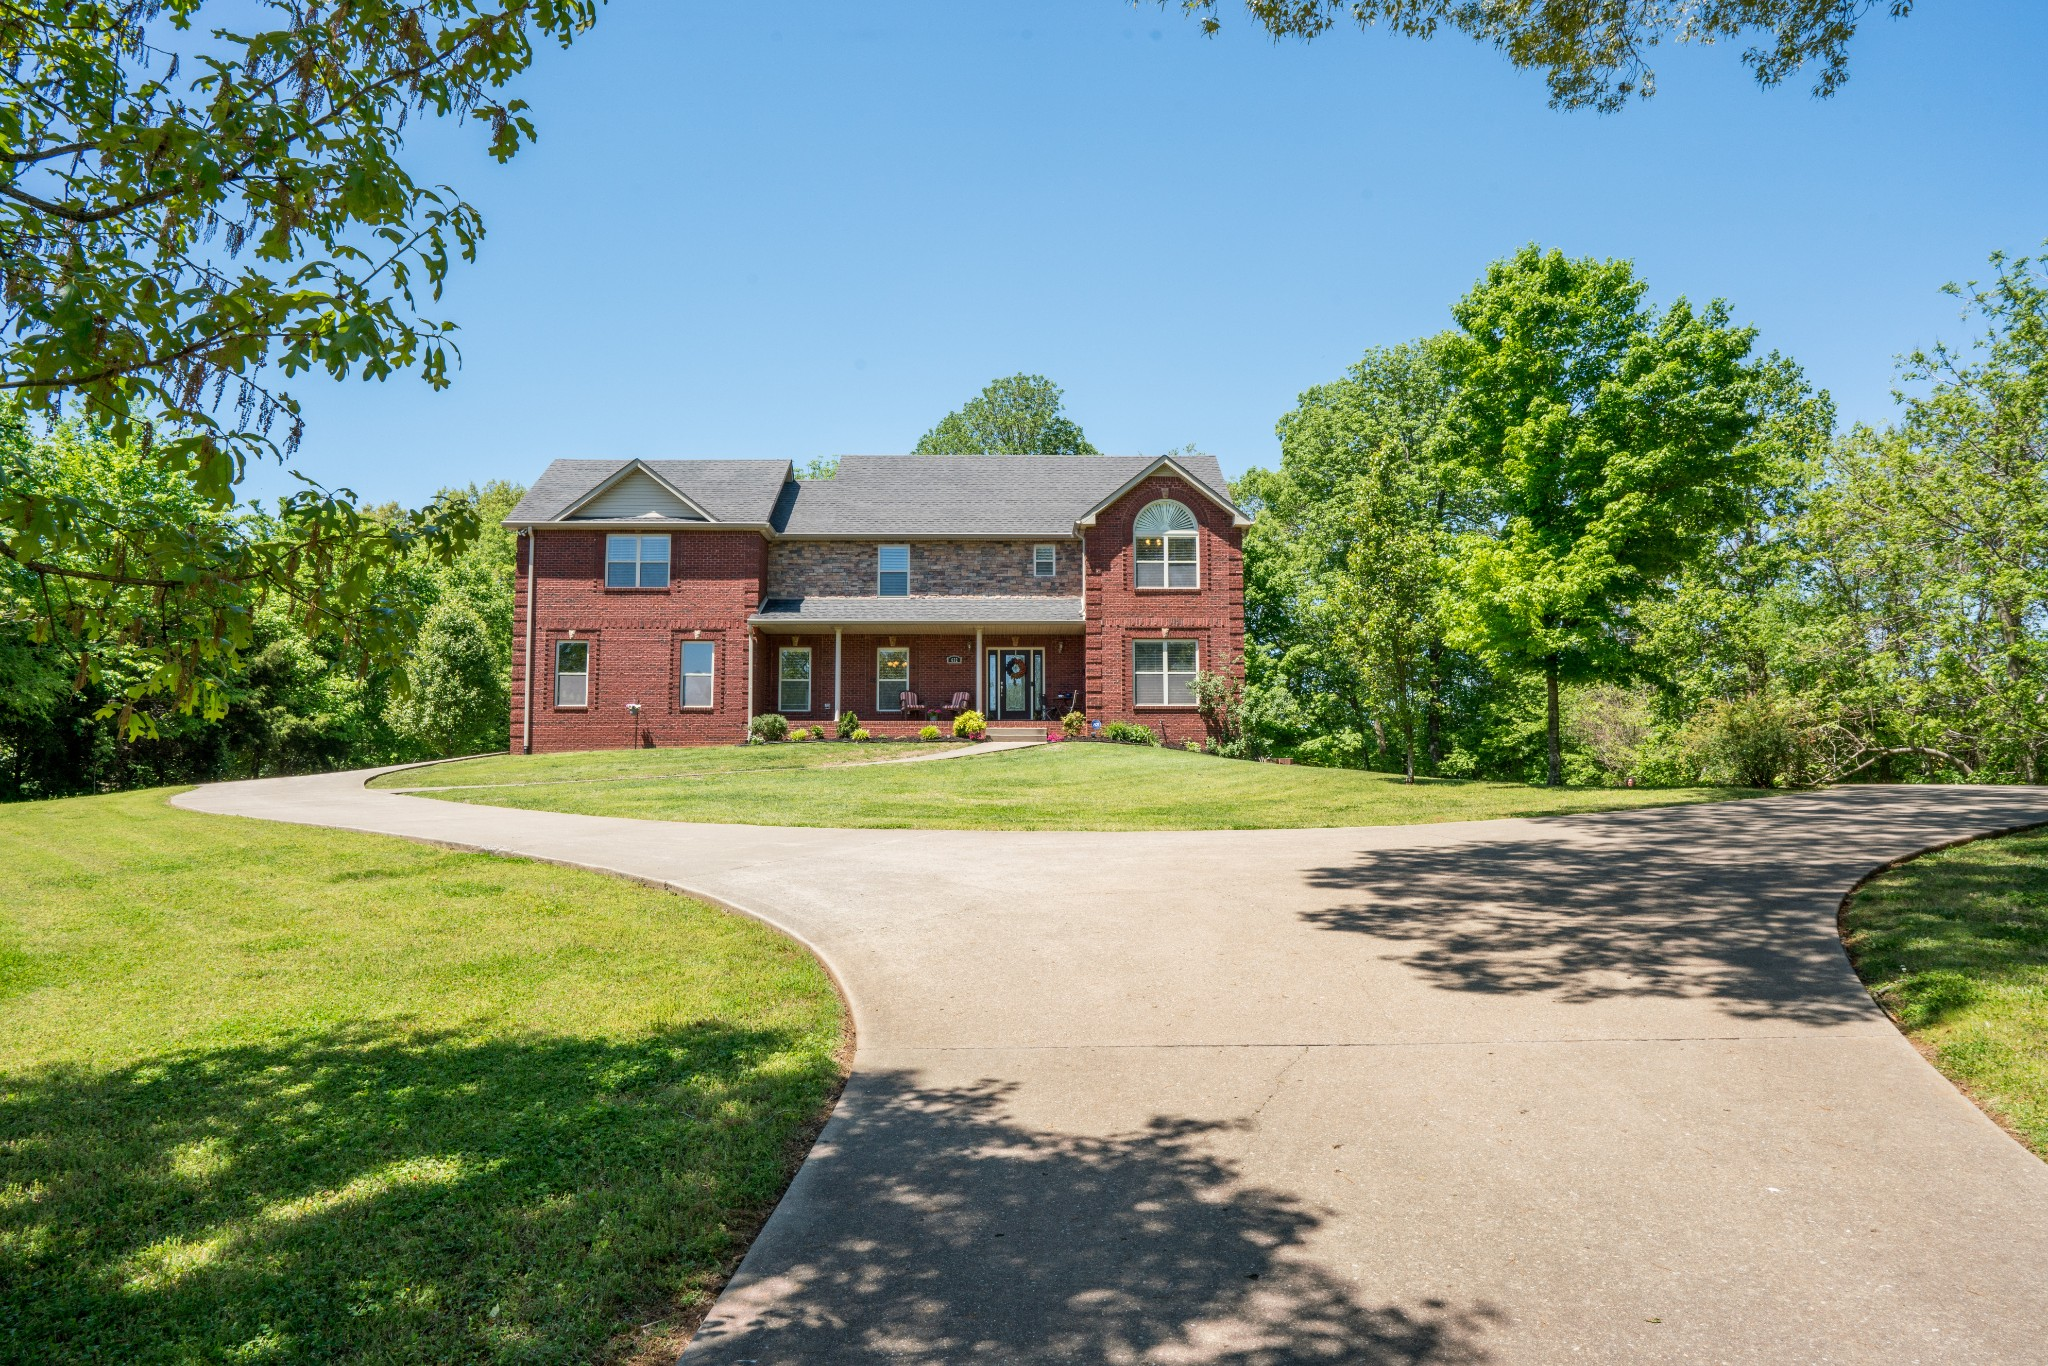 632 N Woodson Rd Property Photo